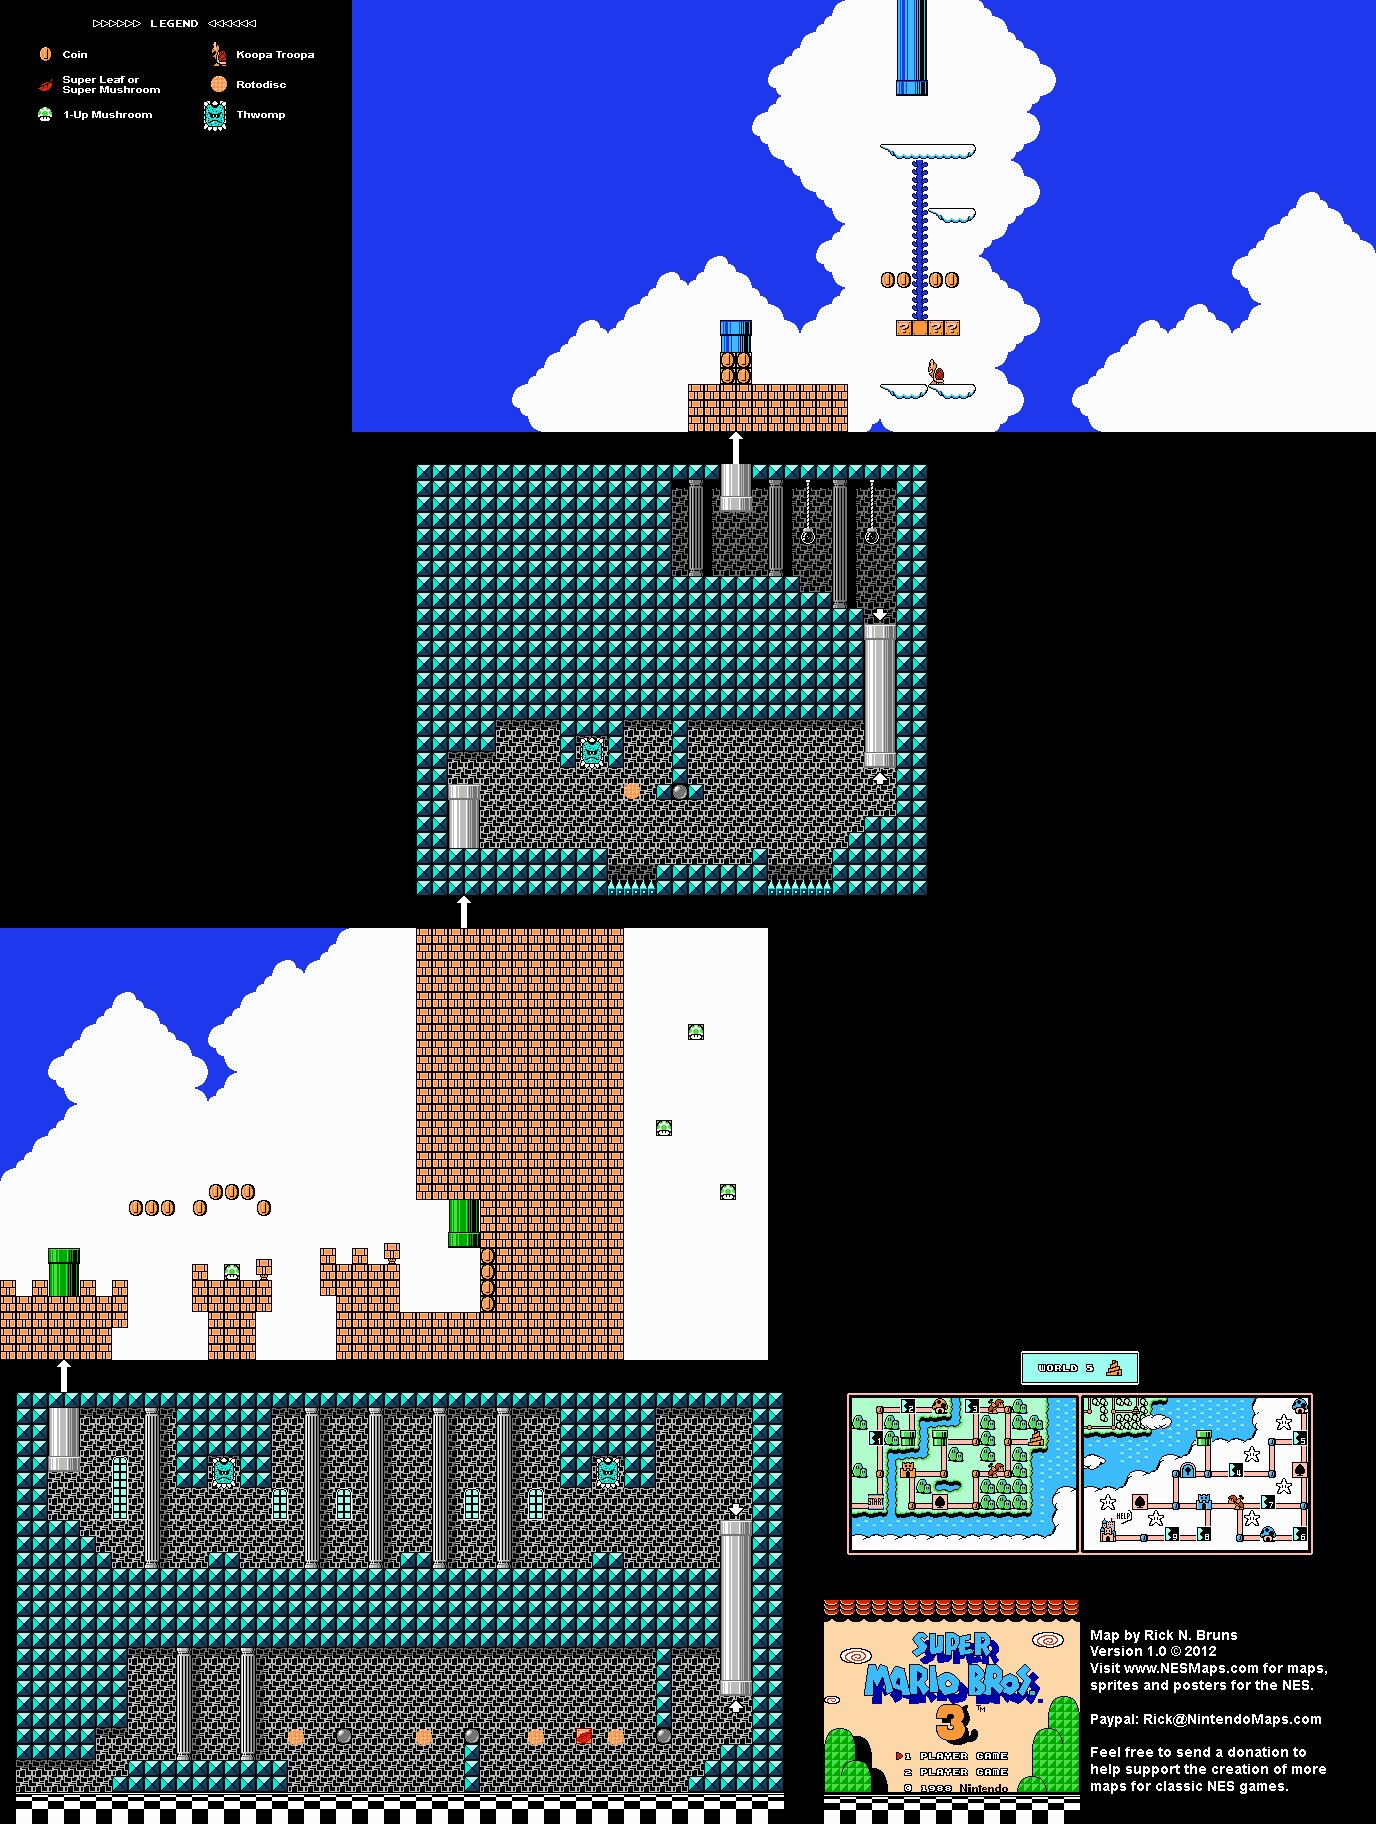 Super Mario Brothers 3 - World 5 Tower Nintendo NES Map